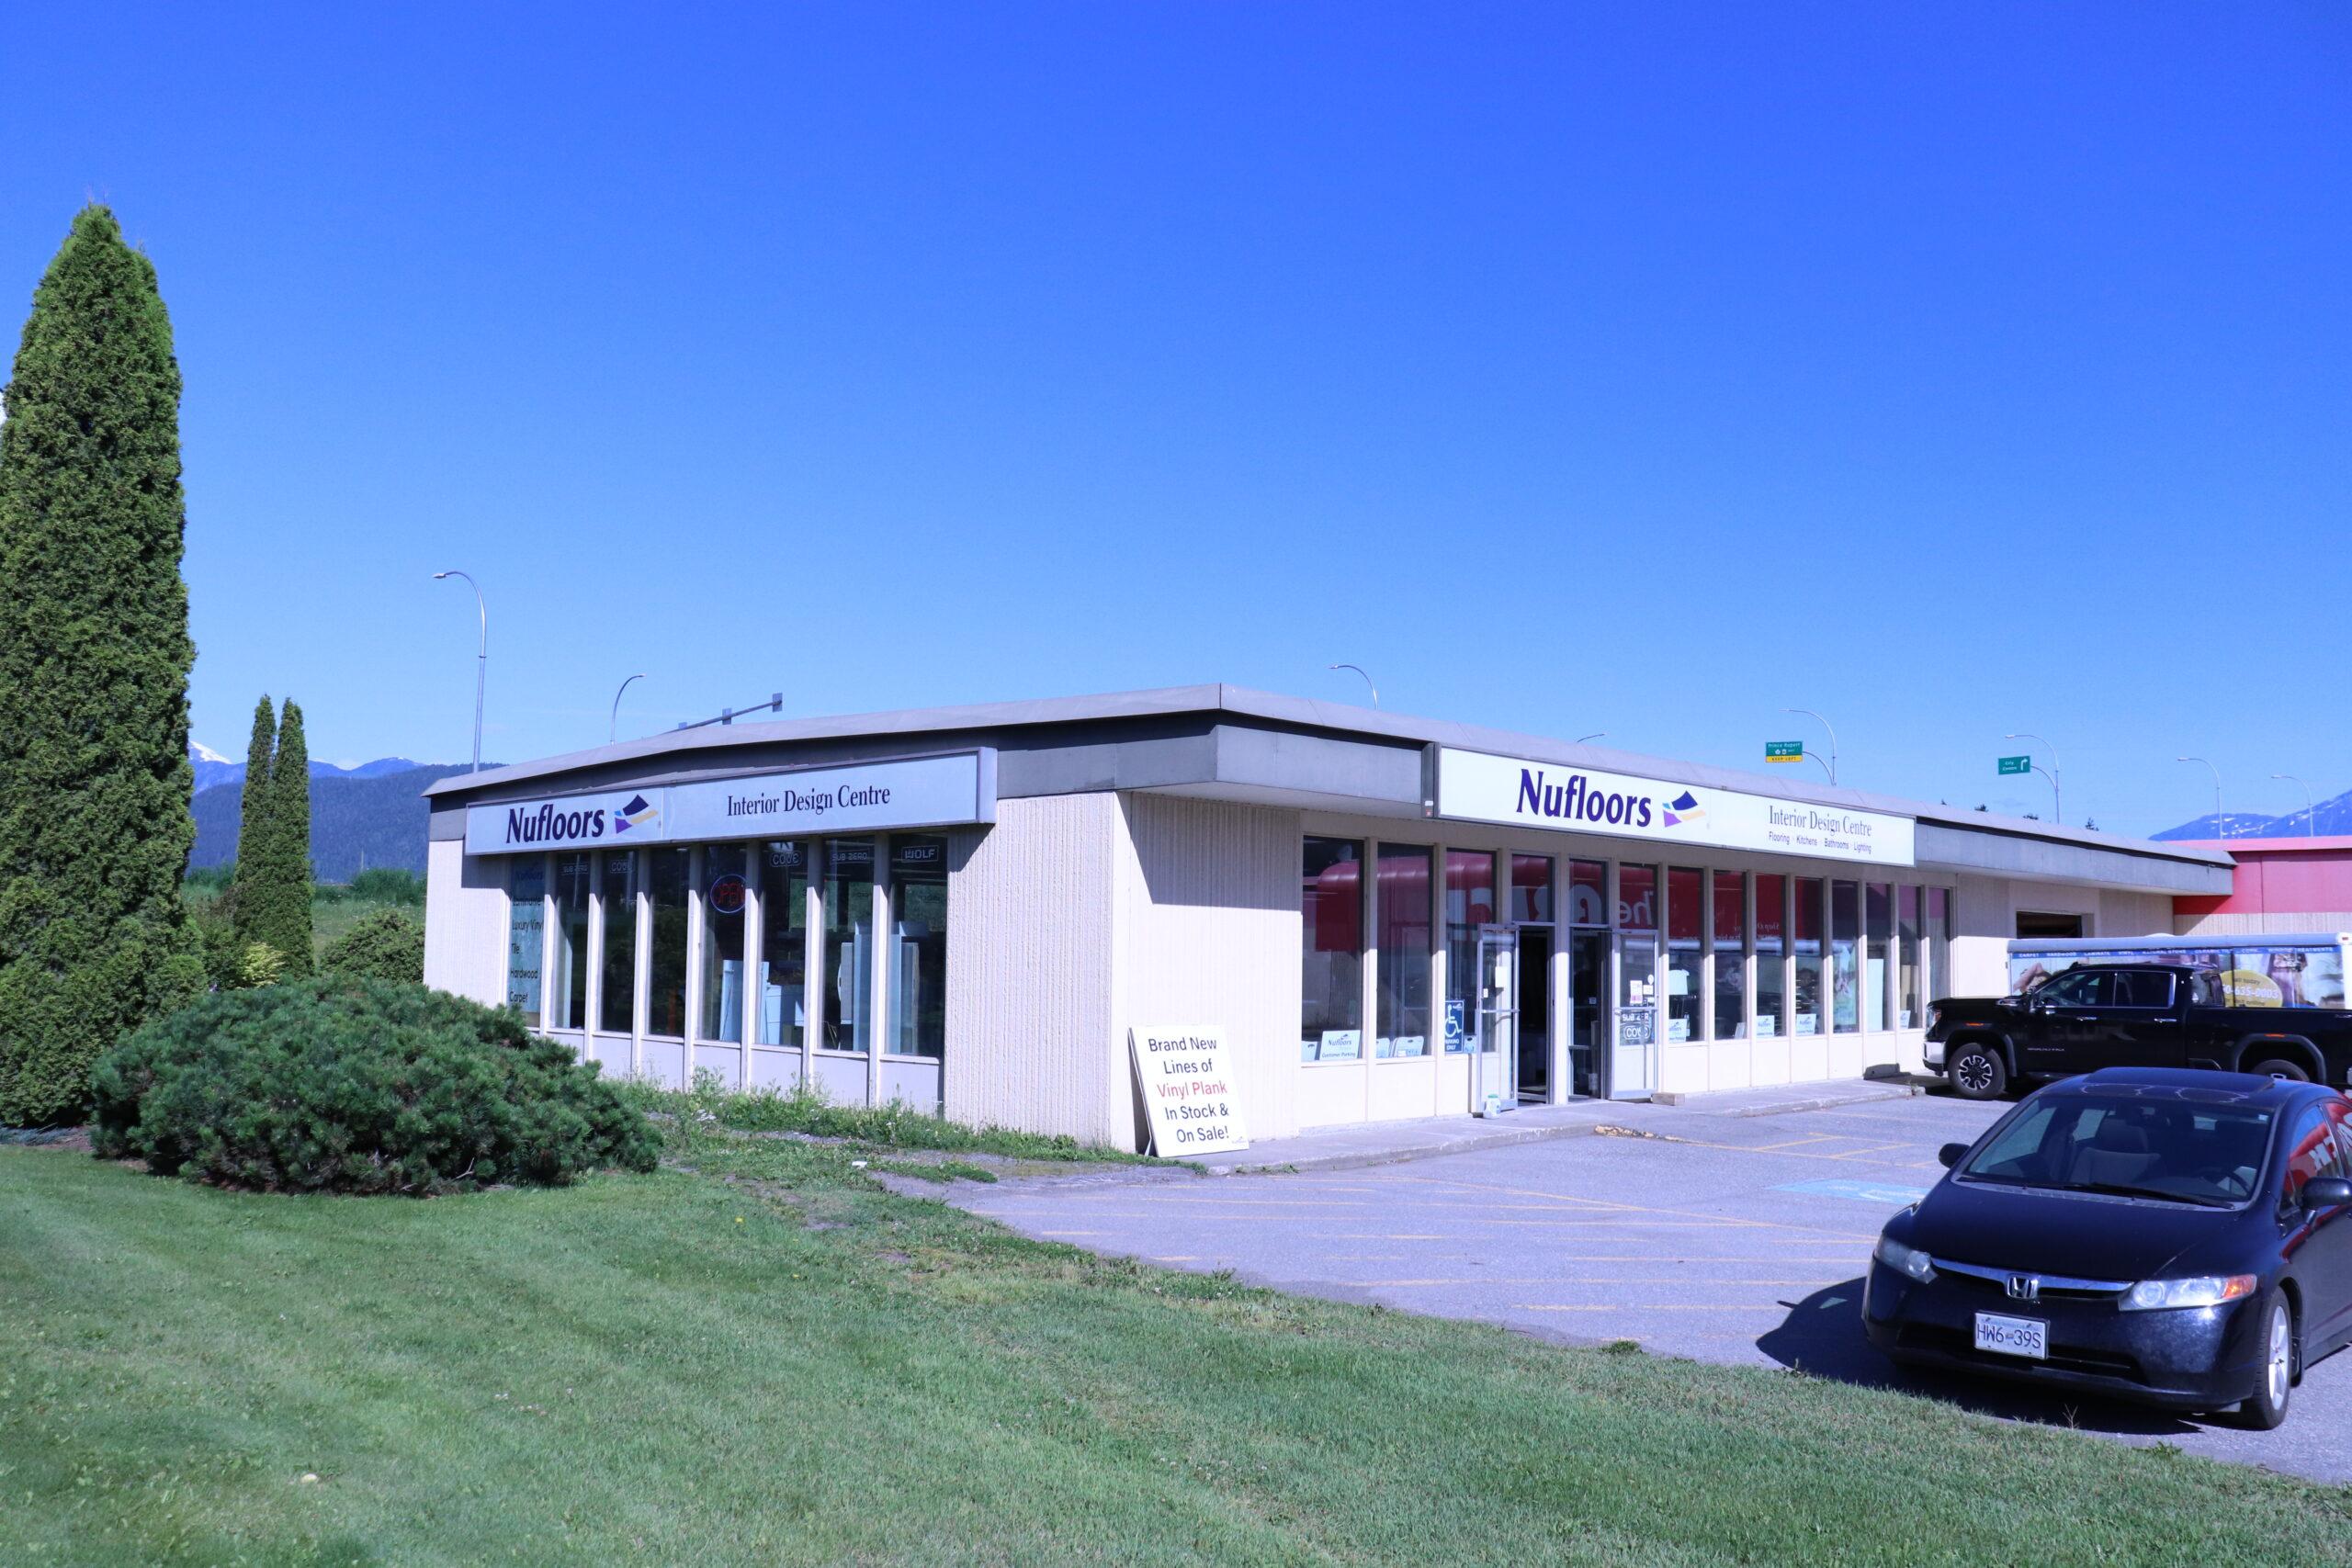 Exterior of Nufloors Terrace Store